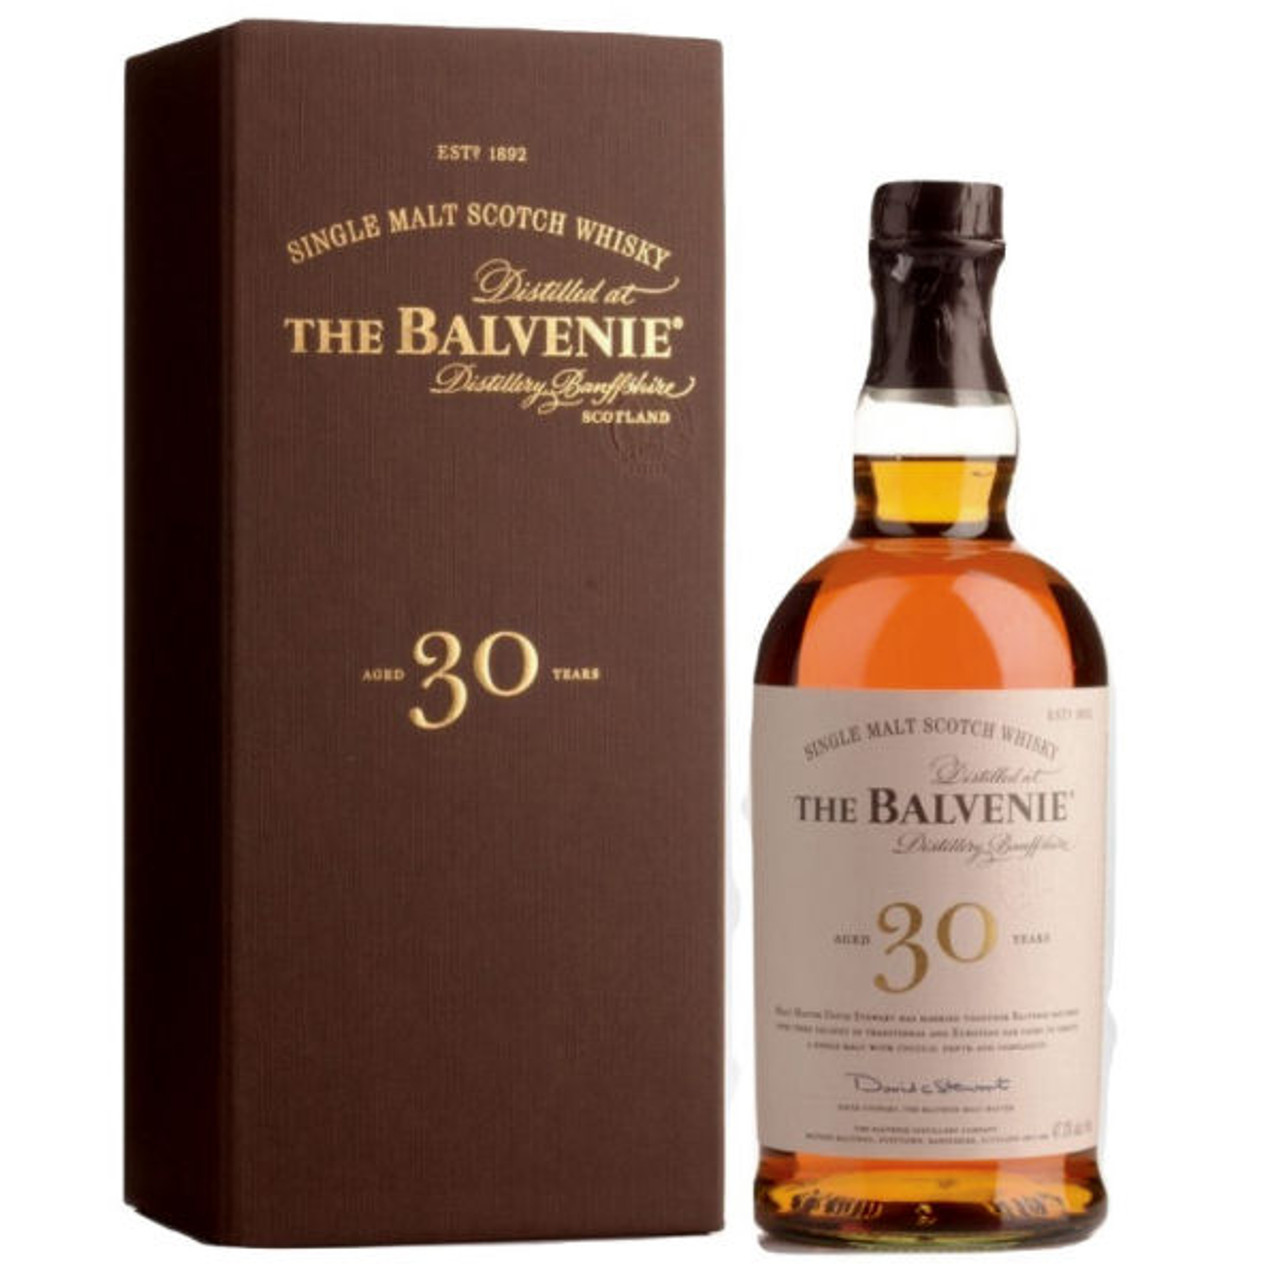 The Balvenie 30 Year Old Speyside Single Malt Scotch 750ml